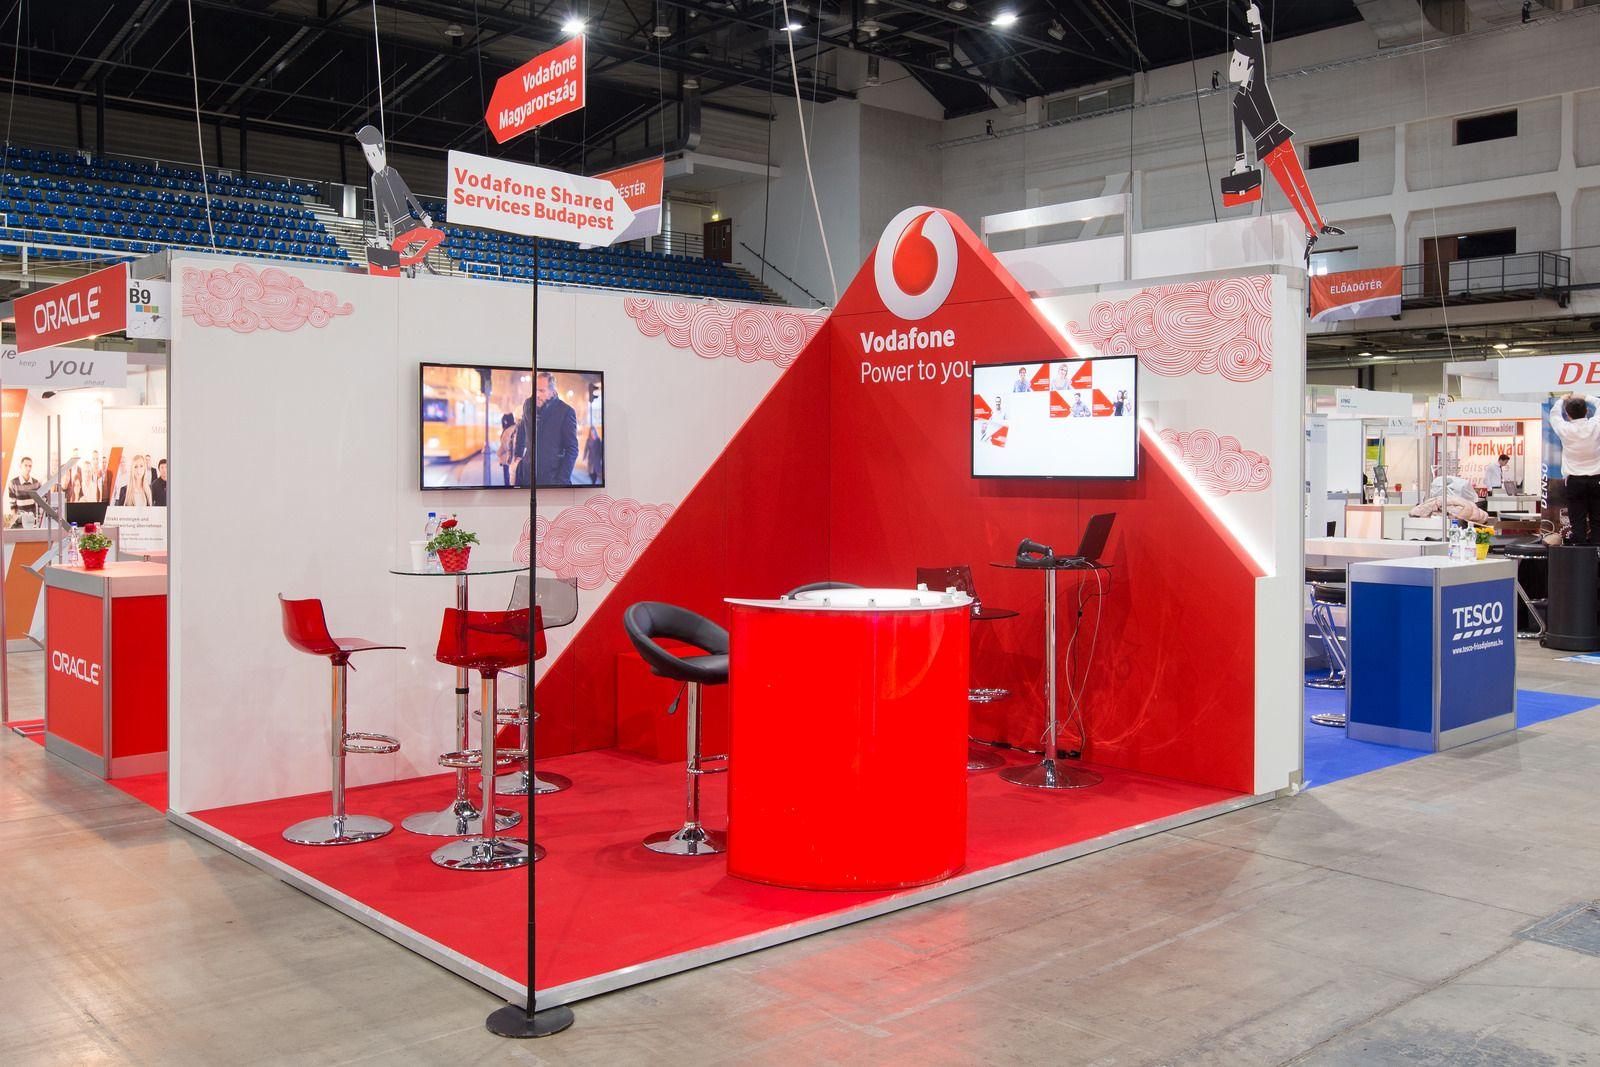 Exhibition Stand Jobs : Hvg job fair ☆ exhibit design ☆ exhibition booth